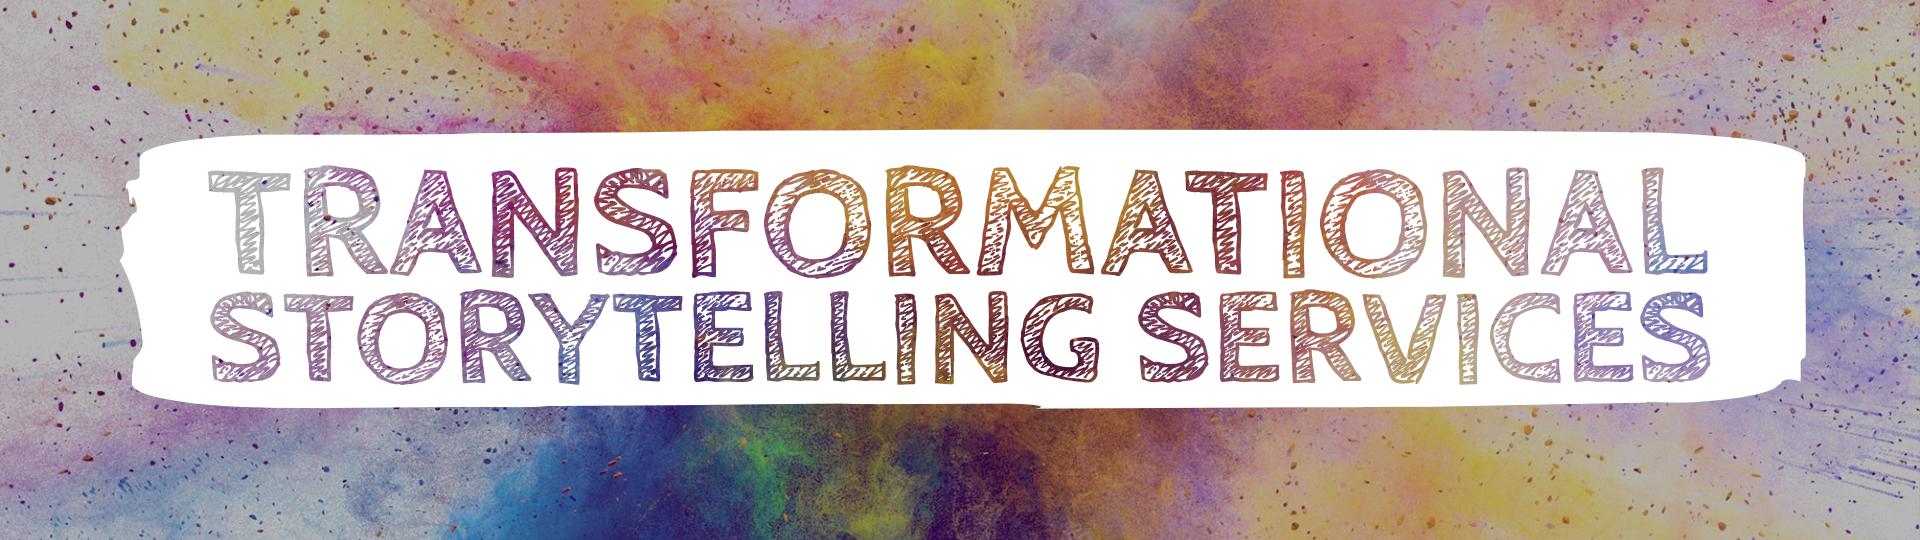 Transformational Storytelling Services-2.jpg